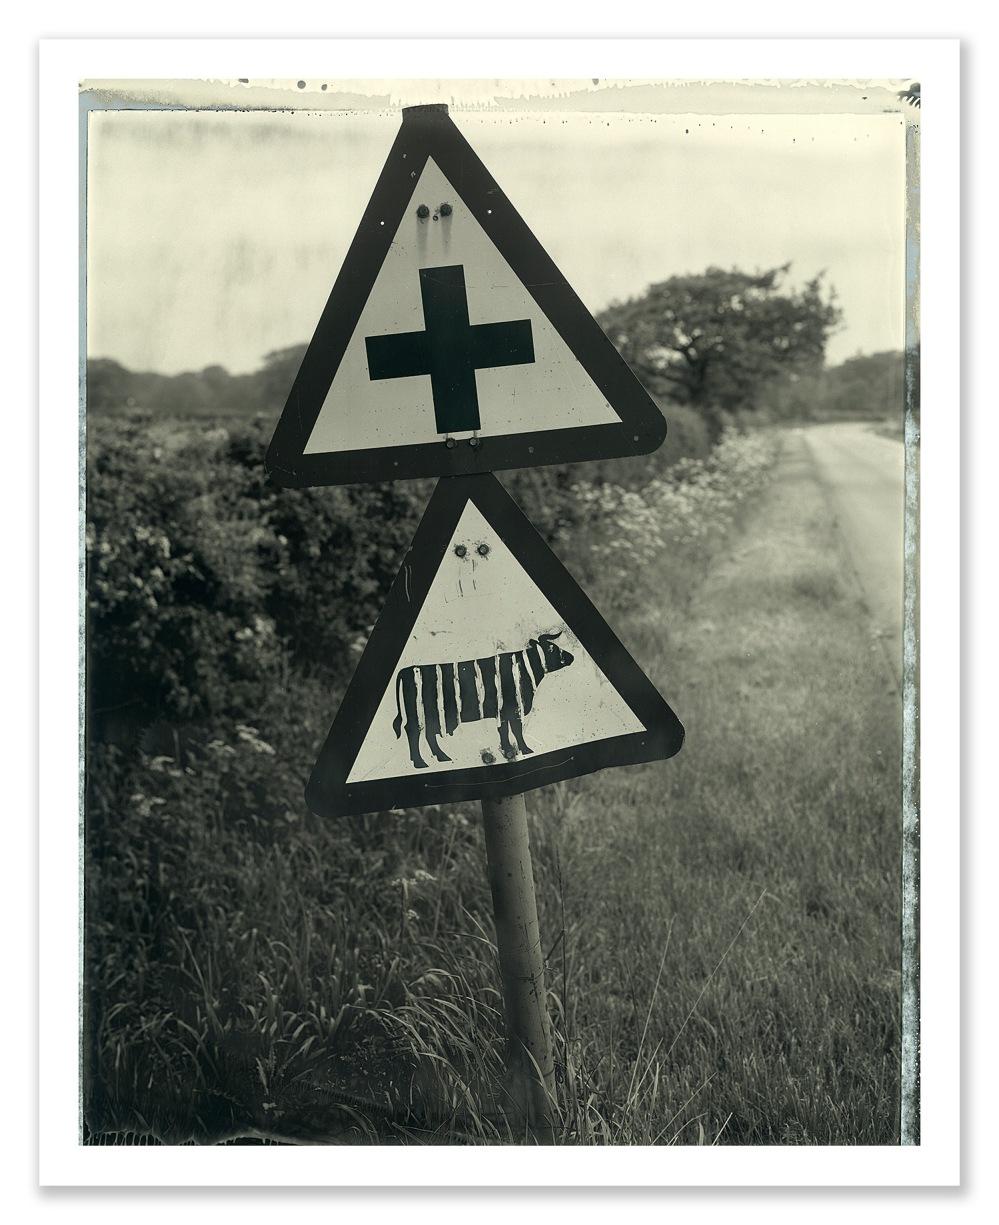 easton_zebra_roadsign